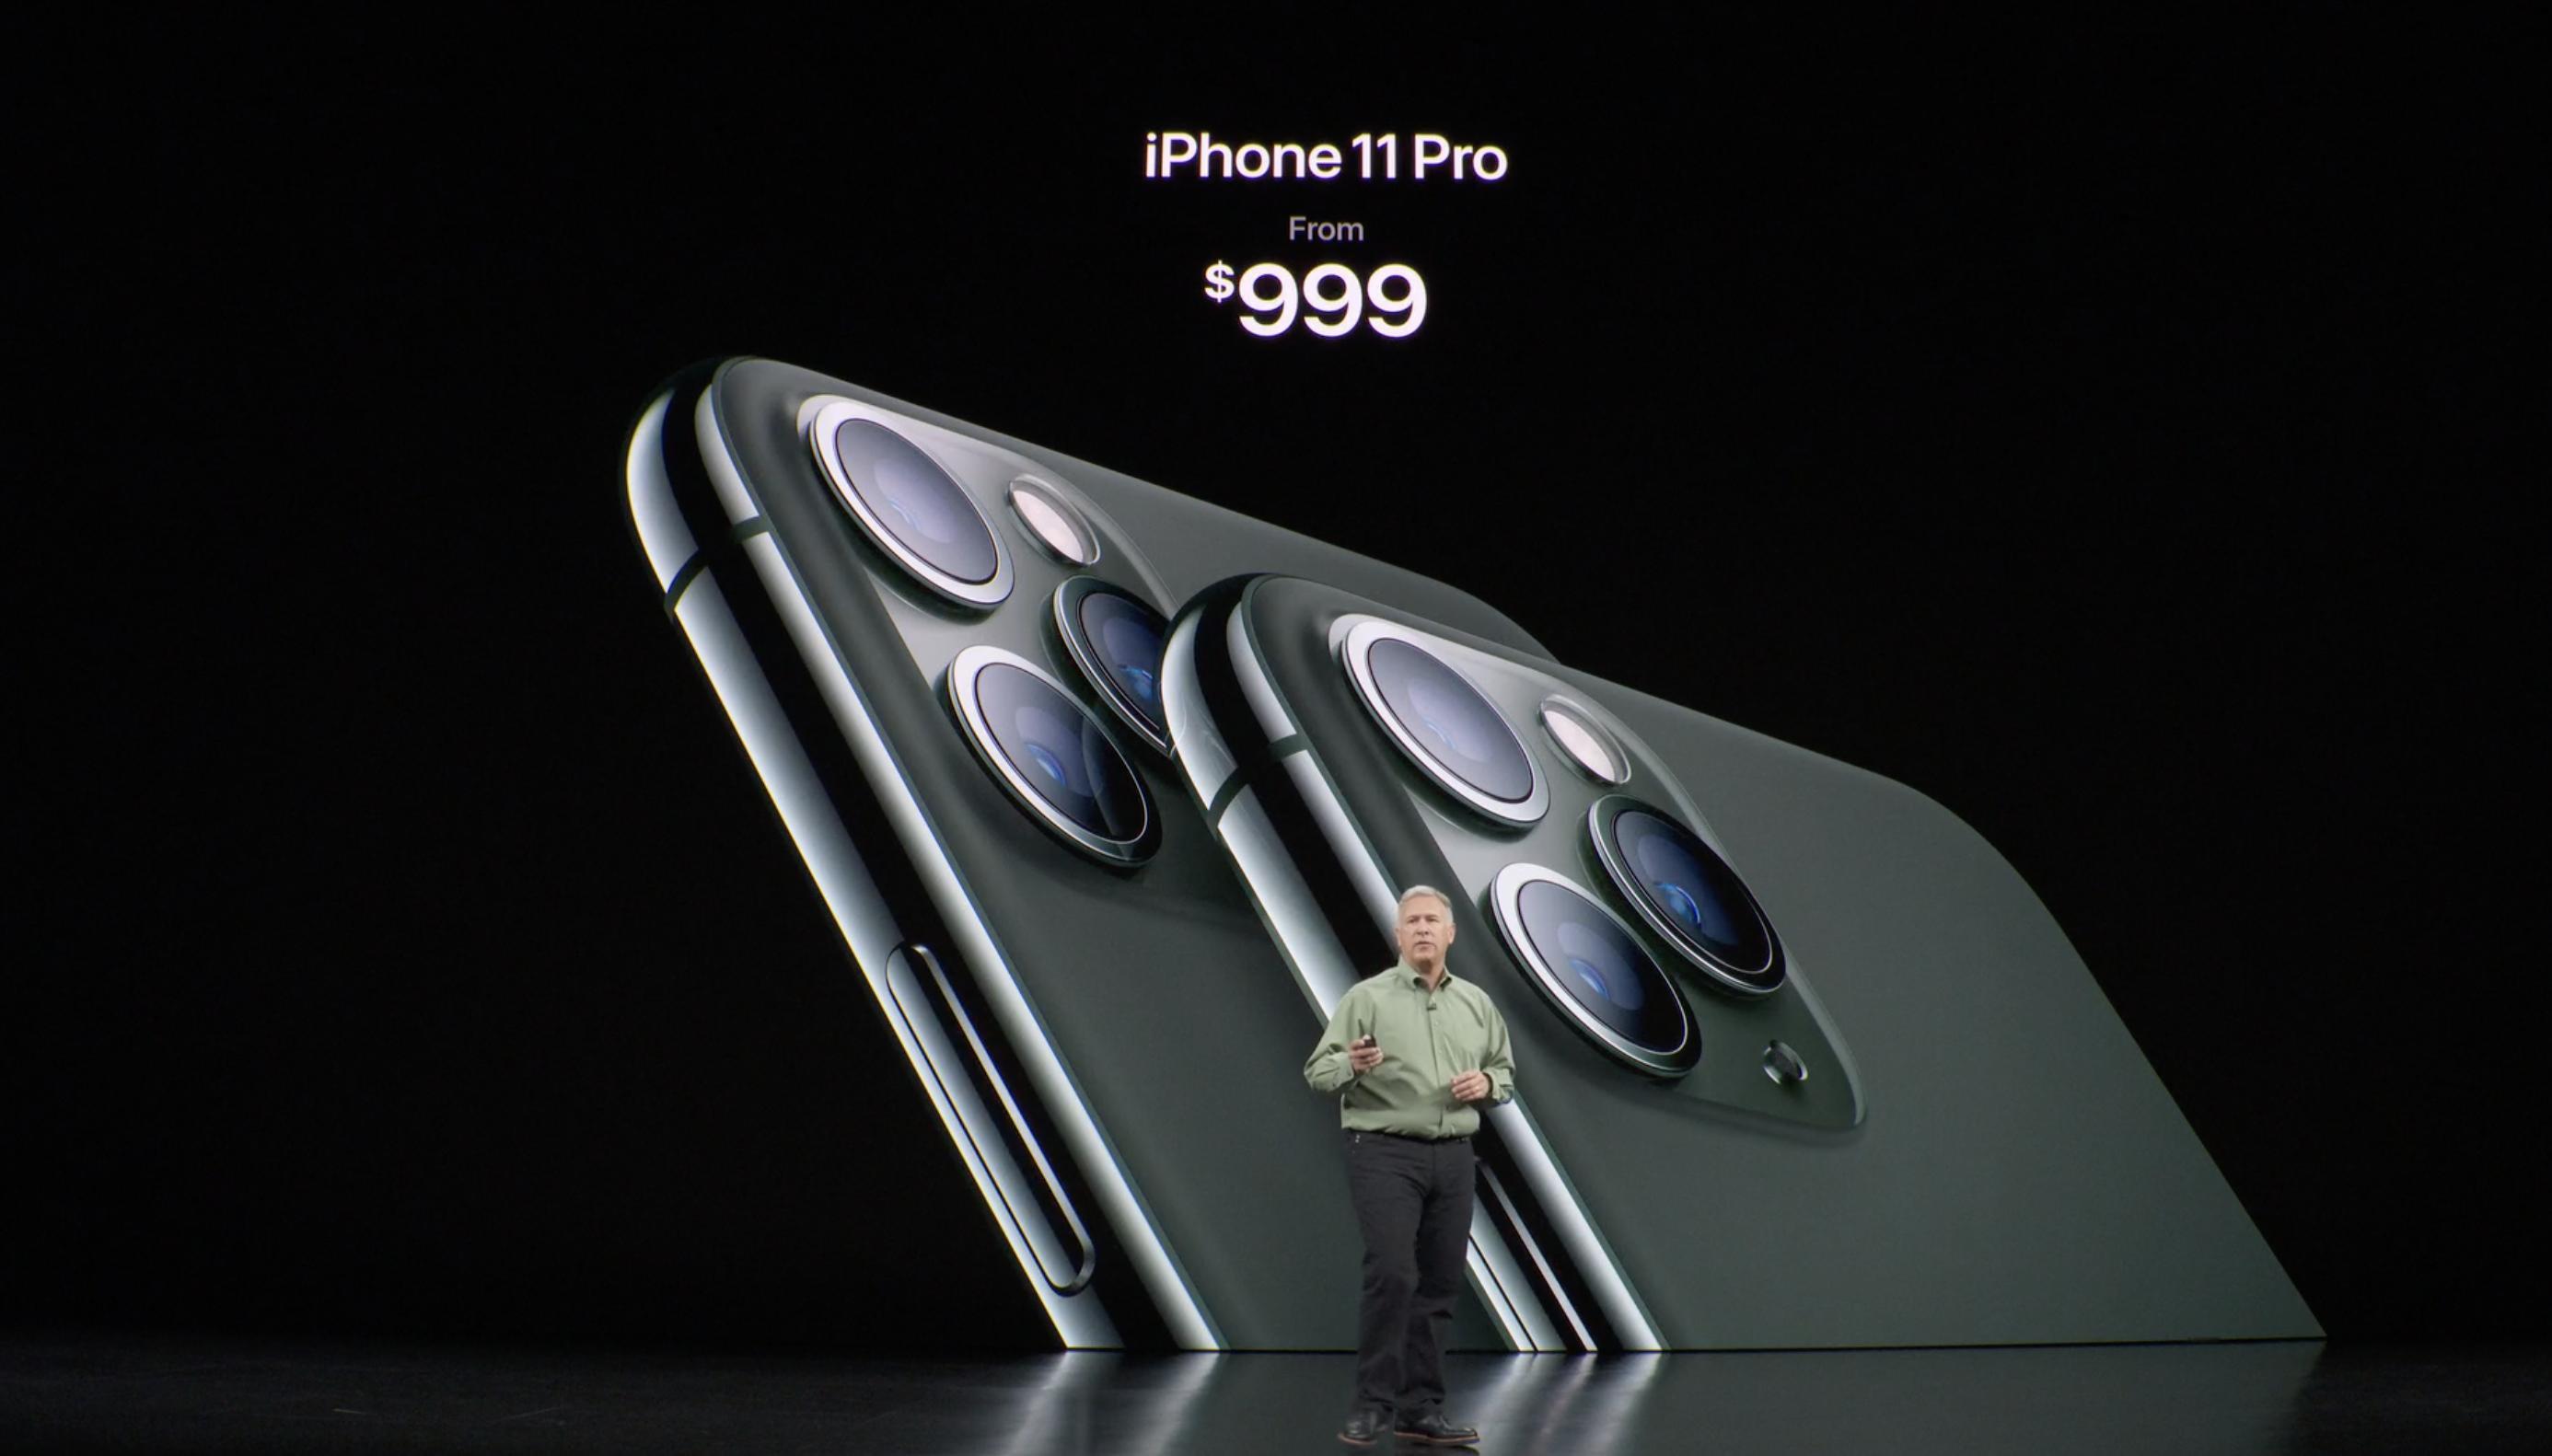 iPhone 11 Pro a 999 dólares